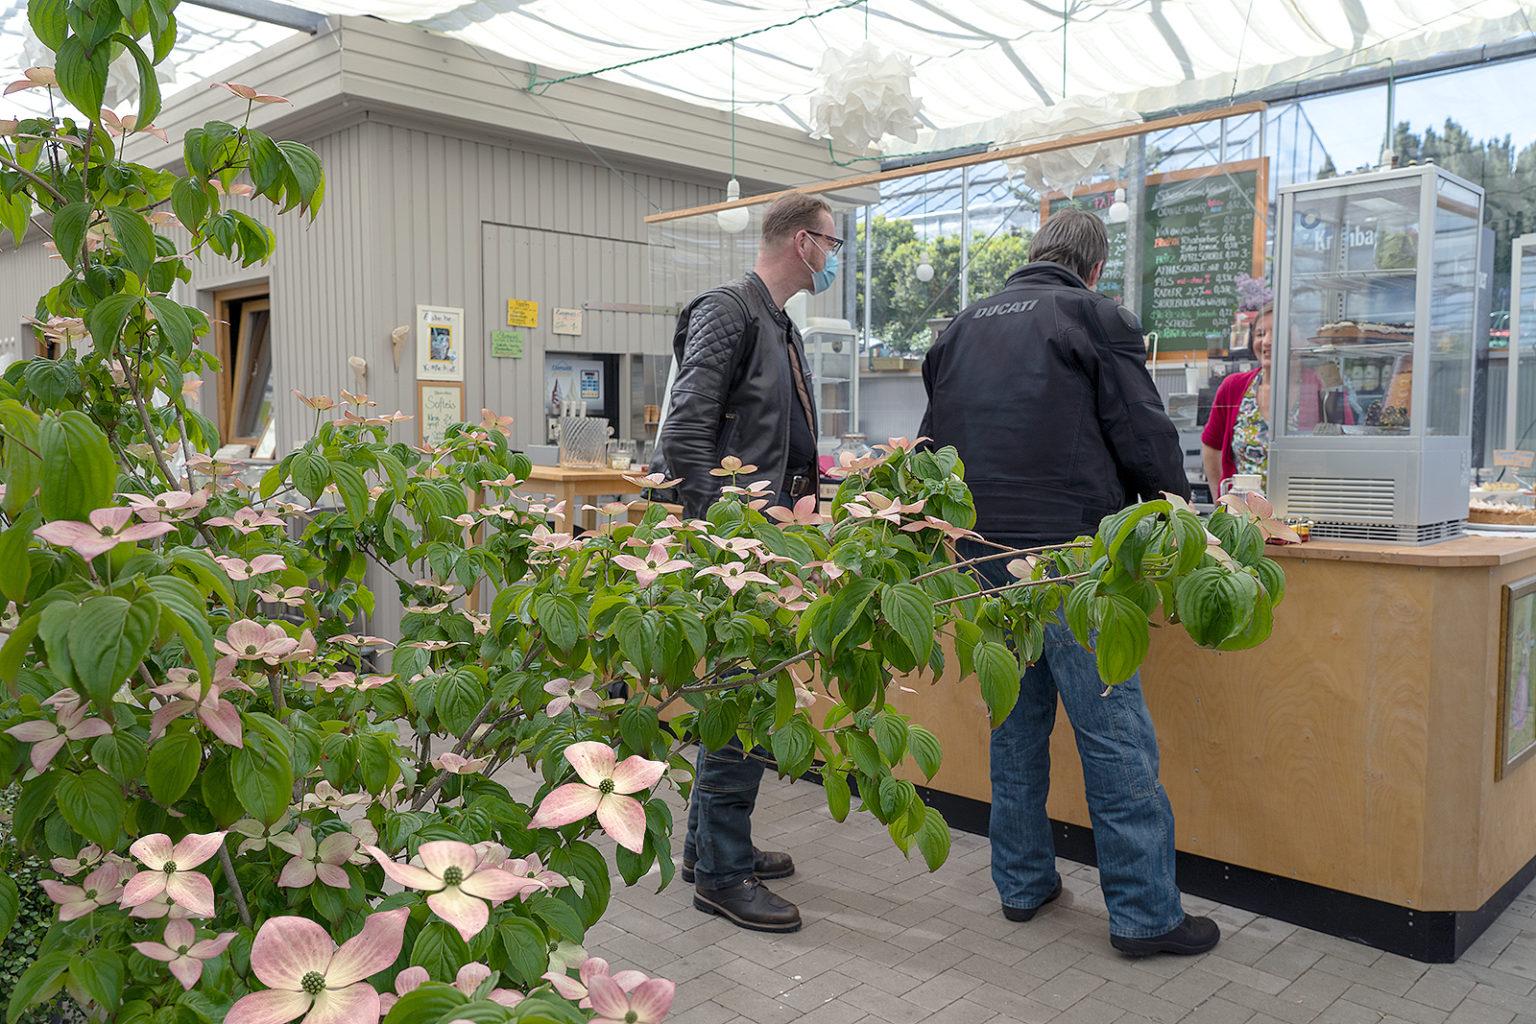 Café im Grünen